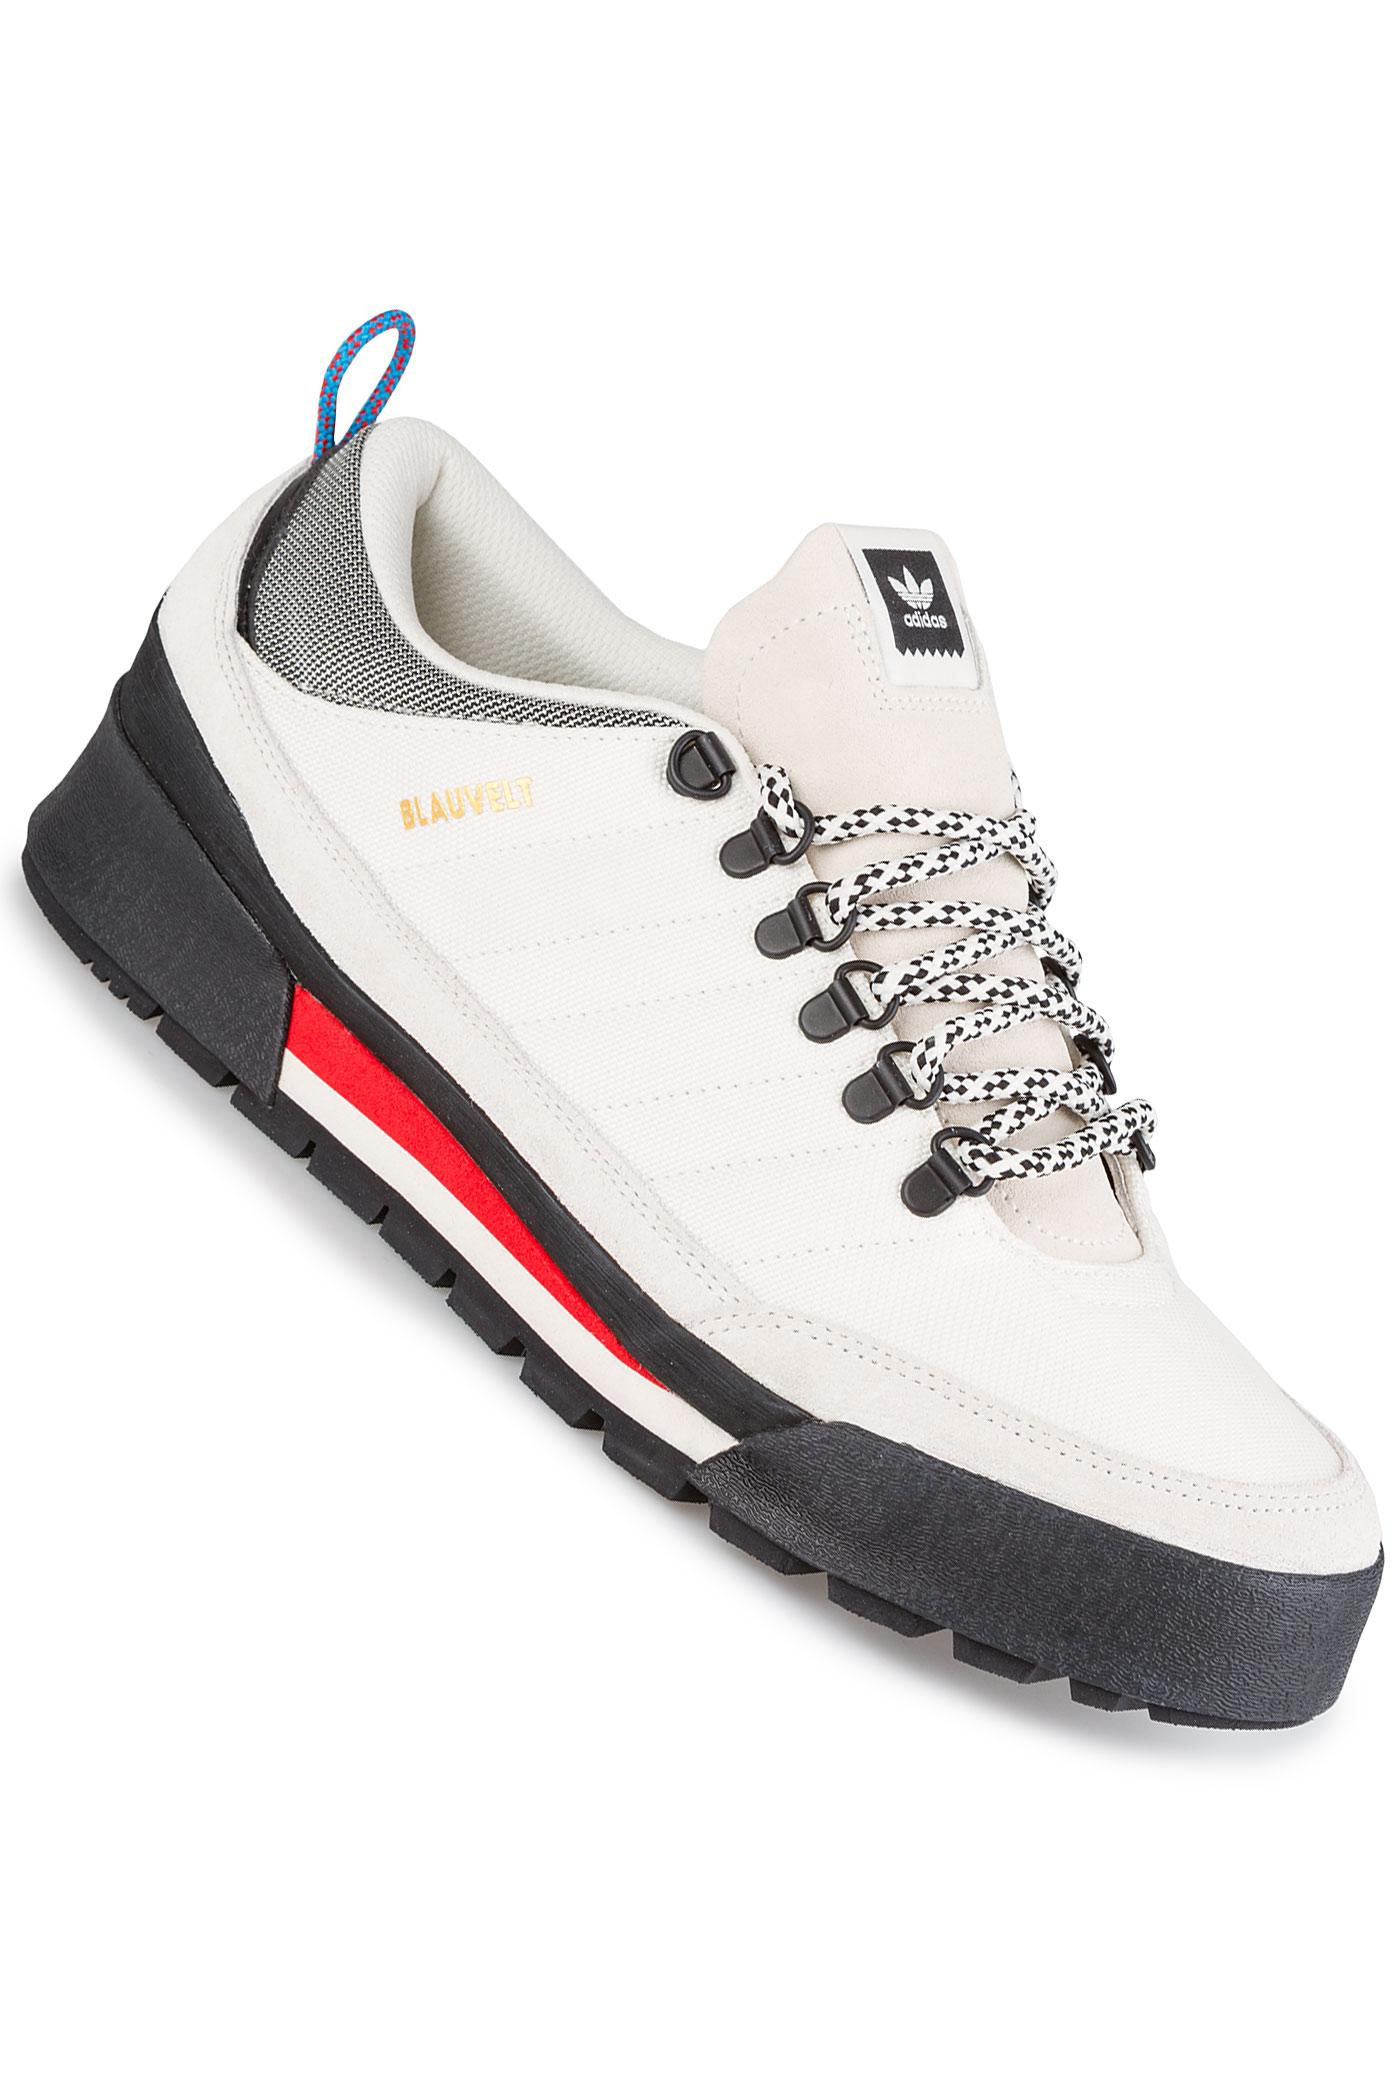 White Chaussureoff 2 Adidas Black Low Core Jake Boot 0 JTlFc3K1